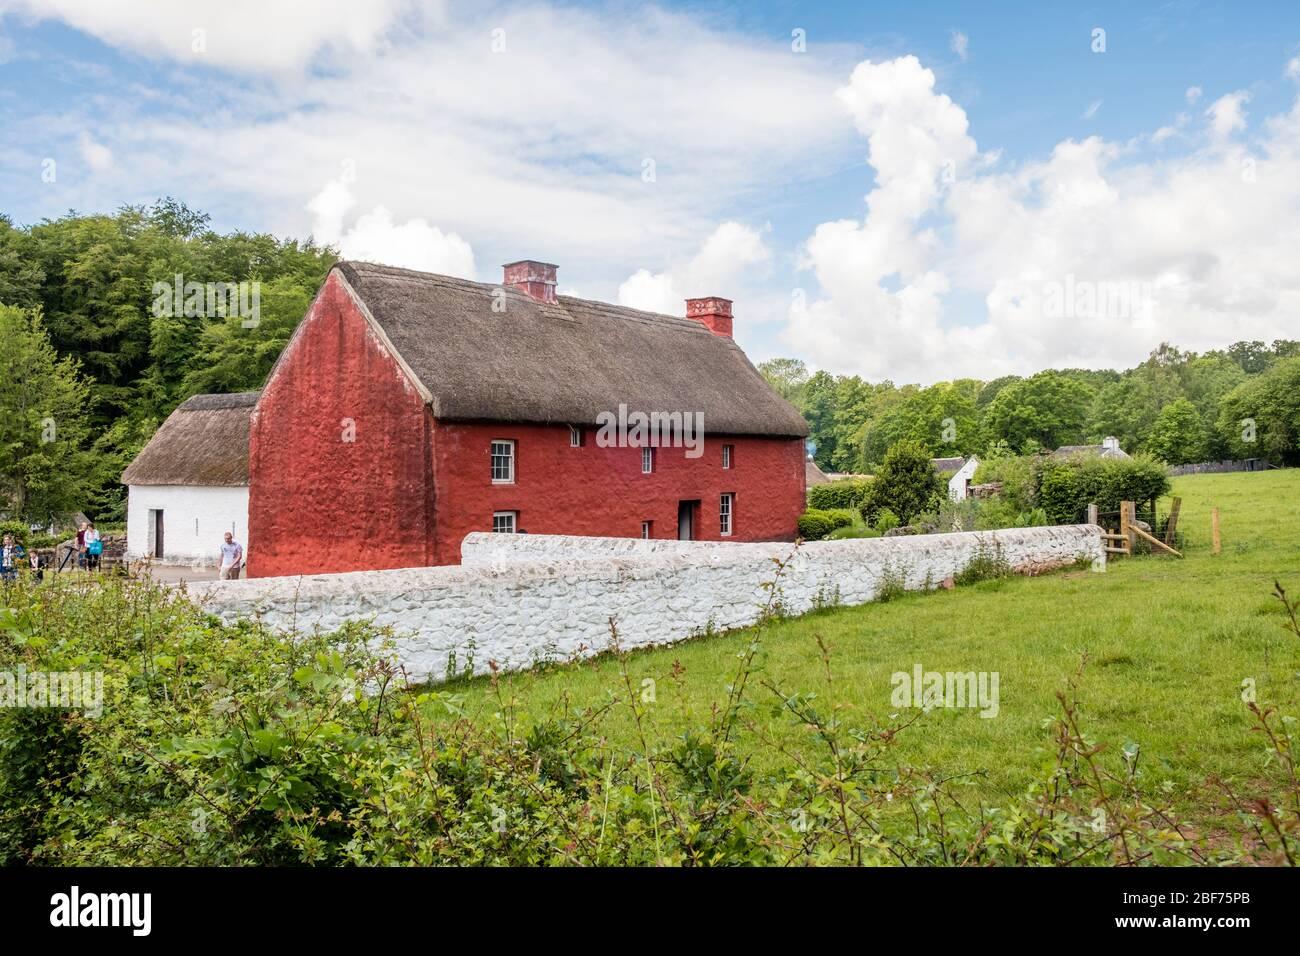 https://c7.alamy.com/comp/2BF75PB/kennixton-farmhouse-st-fagans-national-museum-of-history-cardiff-wales-gb-uk-2BF75PB.jpg